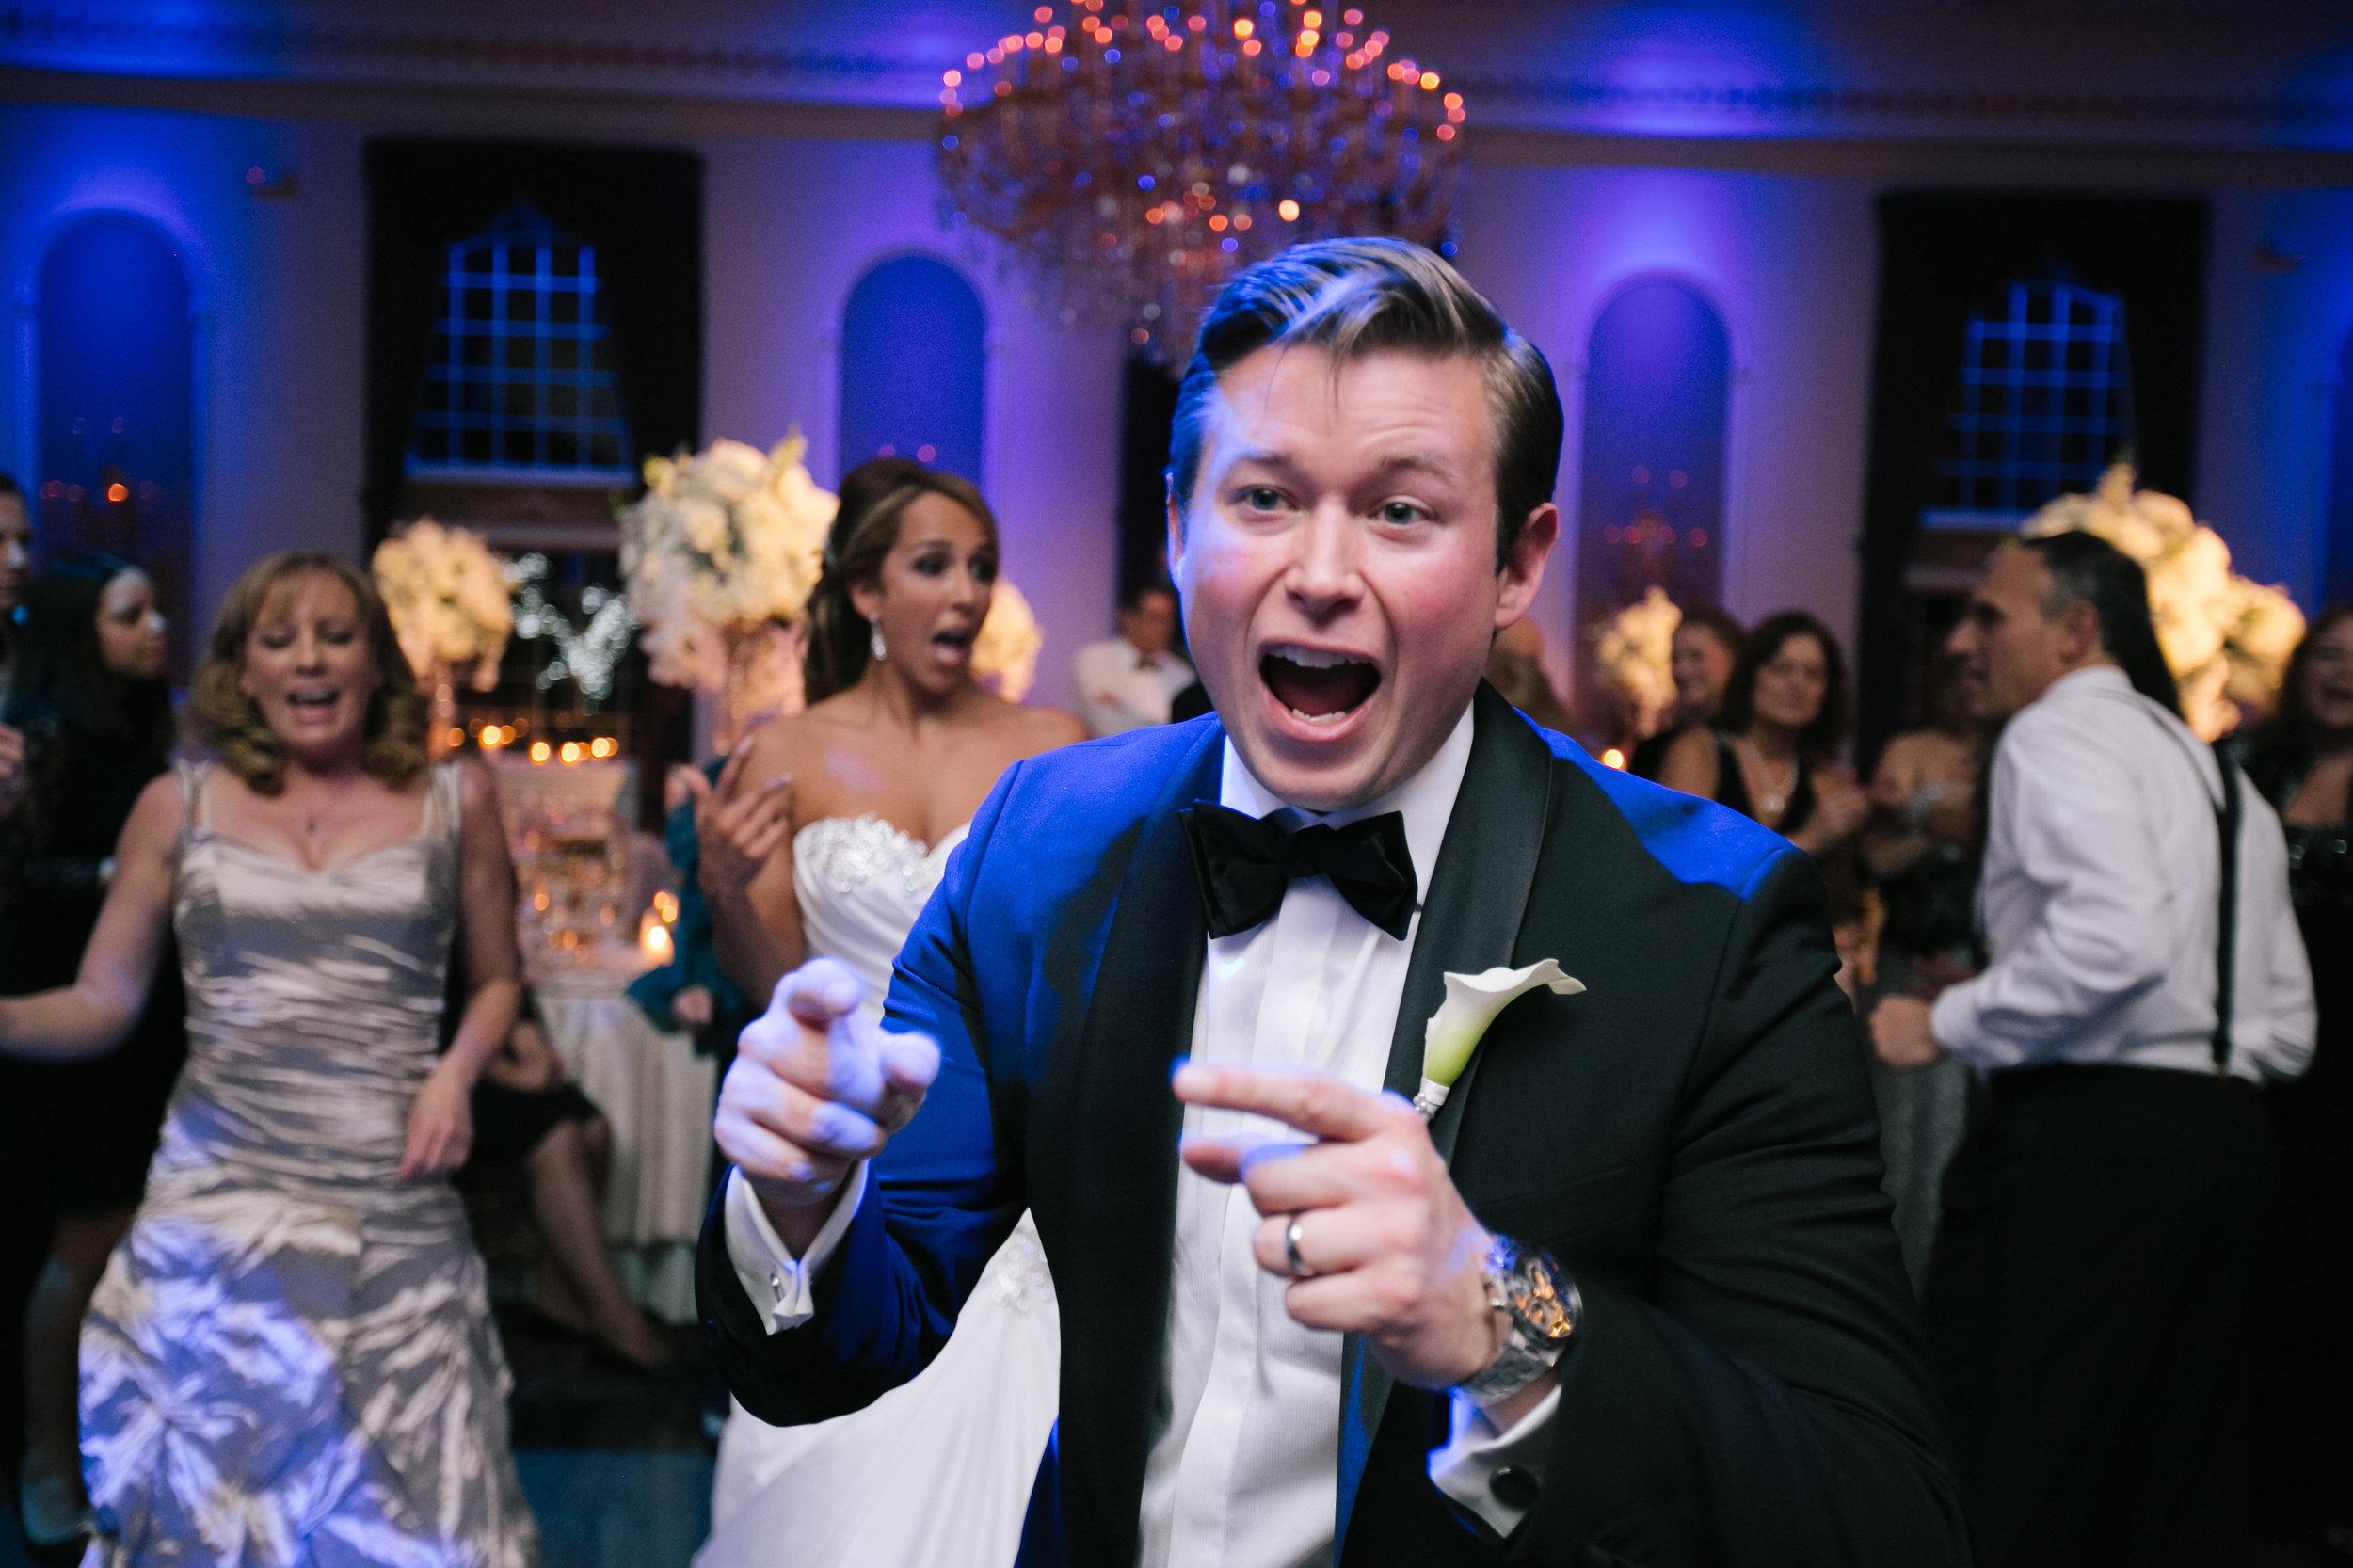 Ceci_New_York_Custom_Invitation_ New_Jersey_Wedding_Luxury_Personalized_Ceci_Style_Bride_Foil_Stamping69.jpg